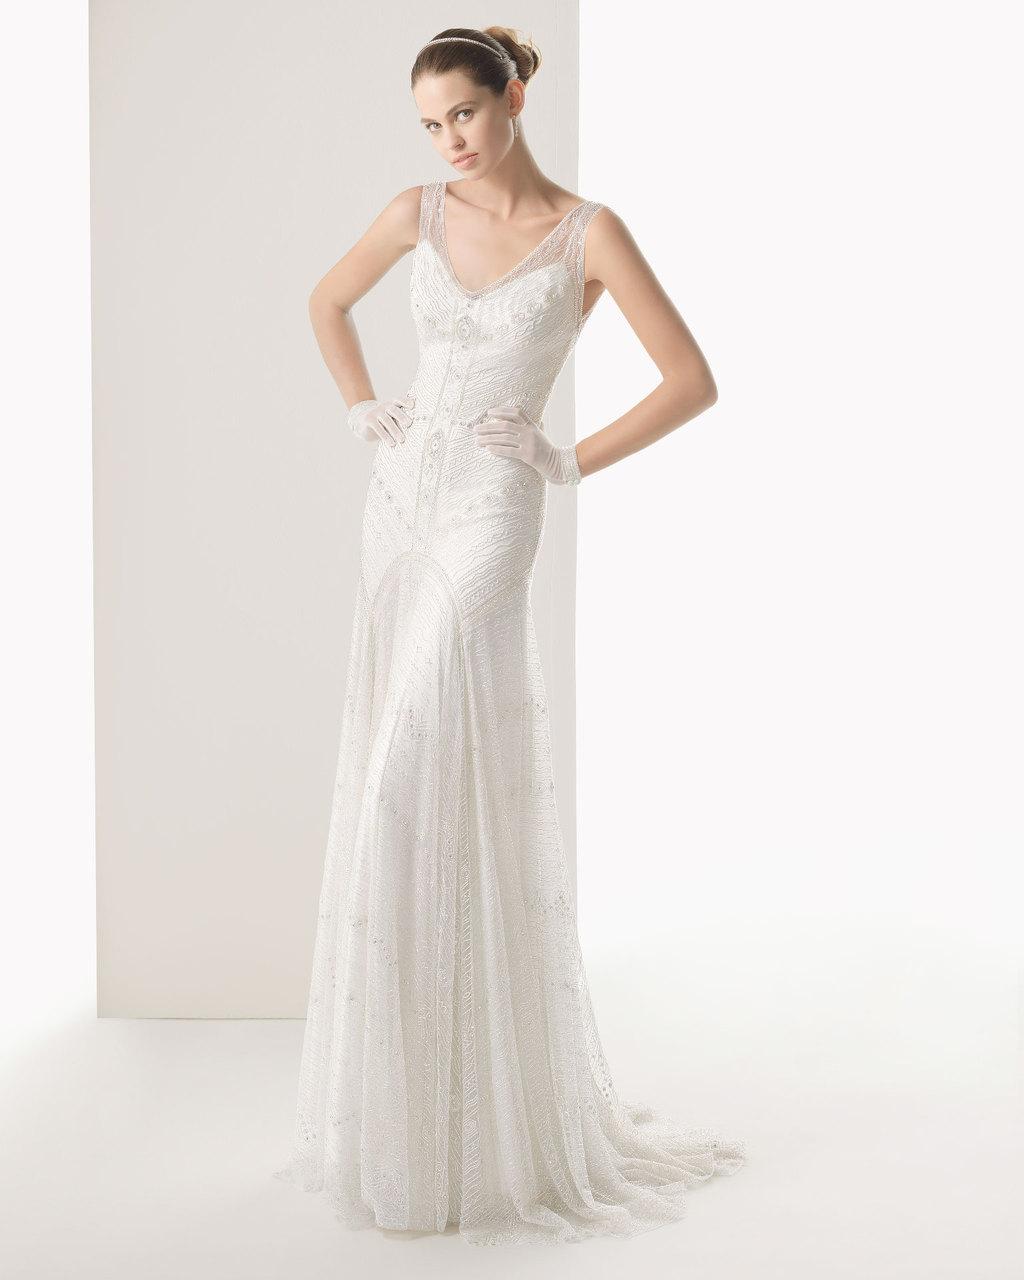 Rosa-clara-wedding-dress-2014-bridal-copla.full